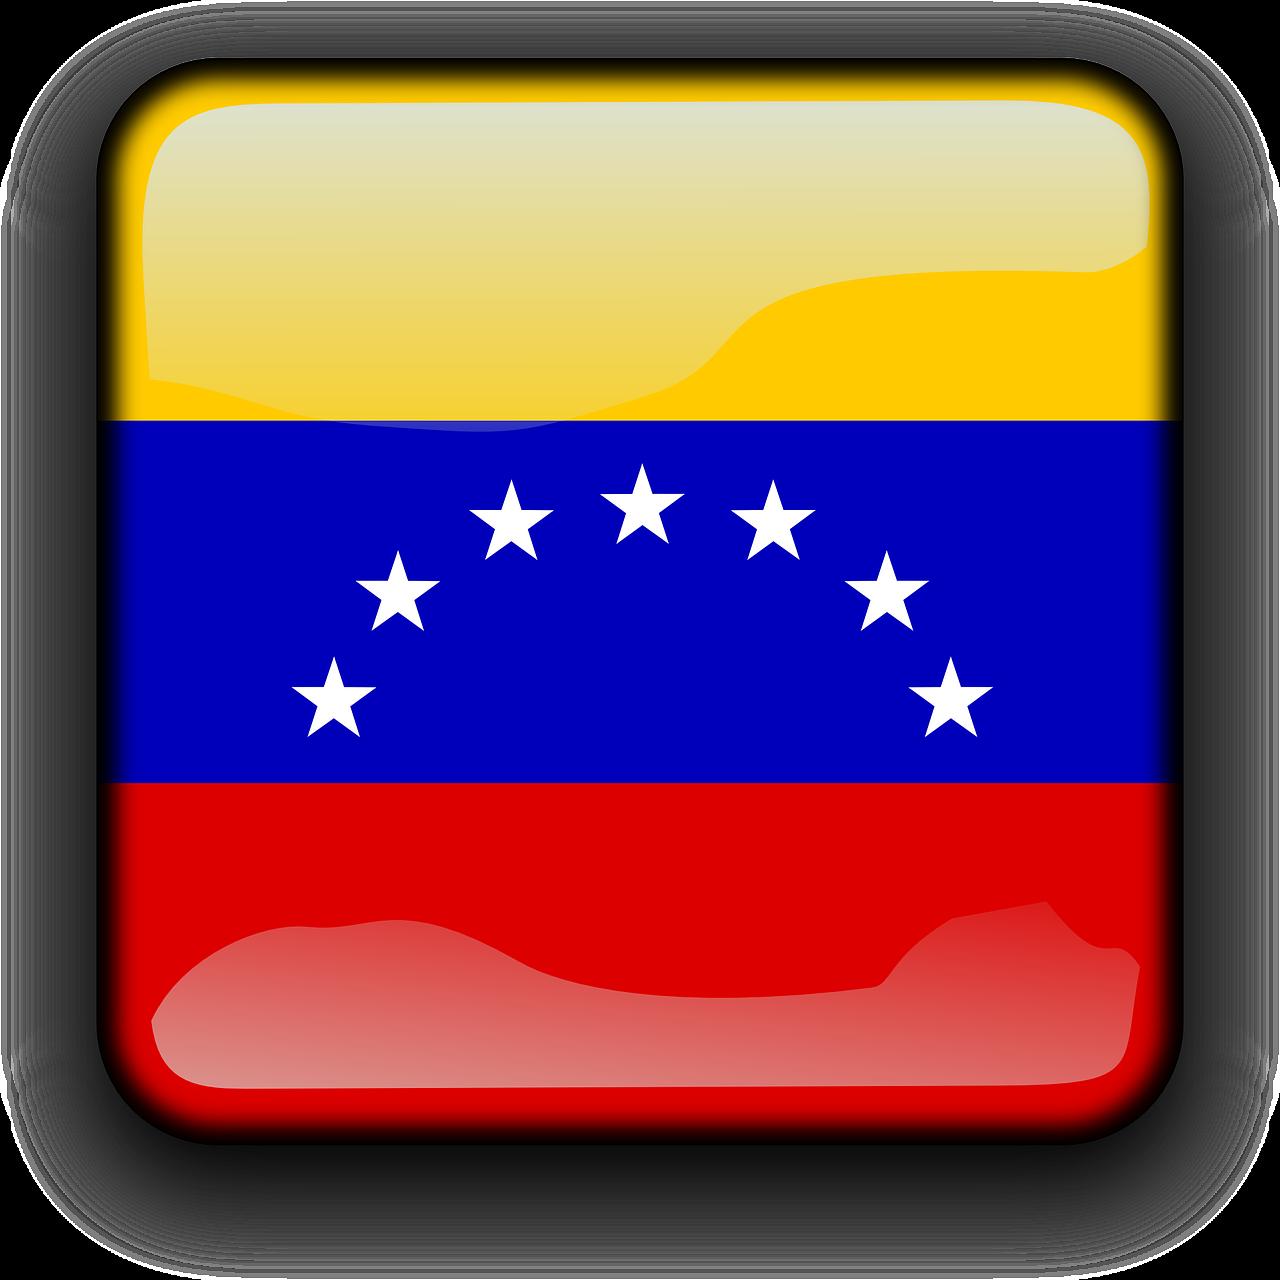 Venezuela Flag PNG | Picpng